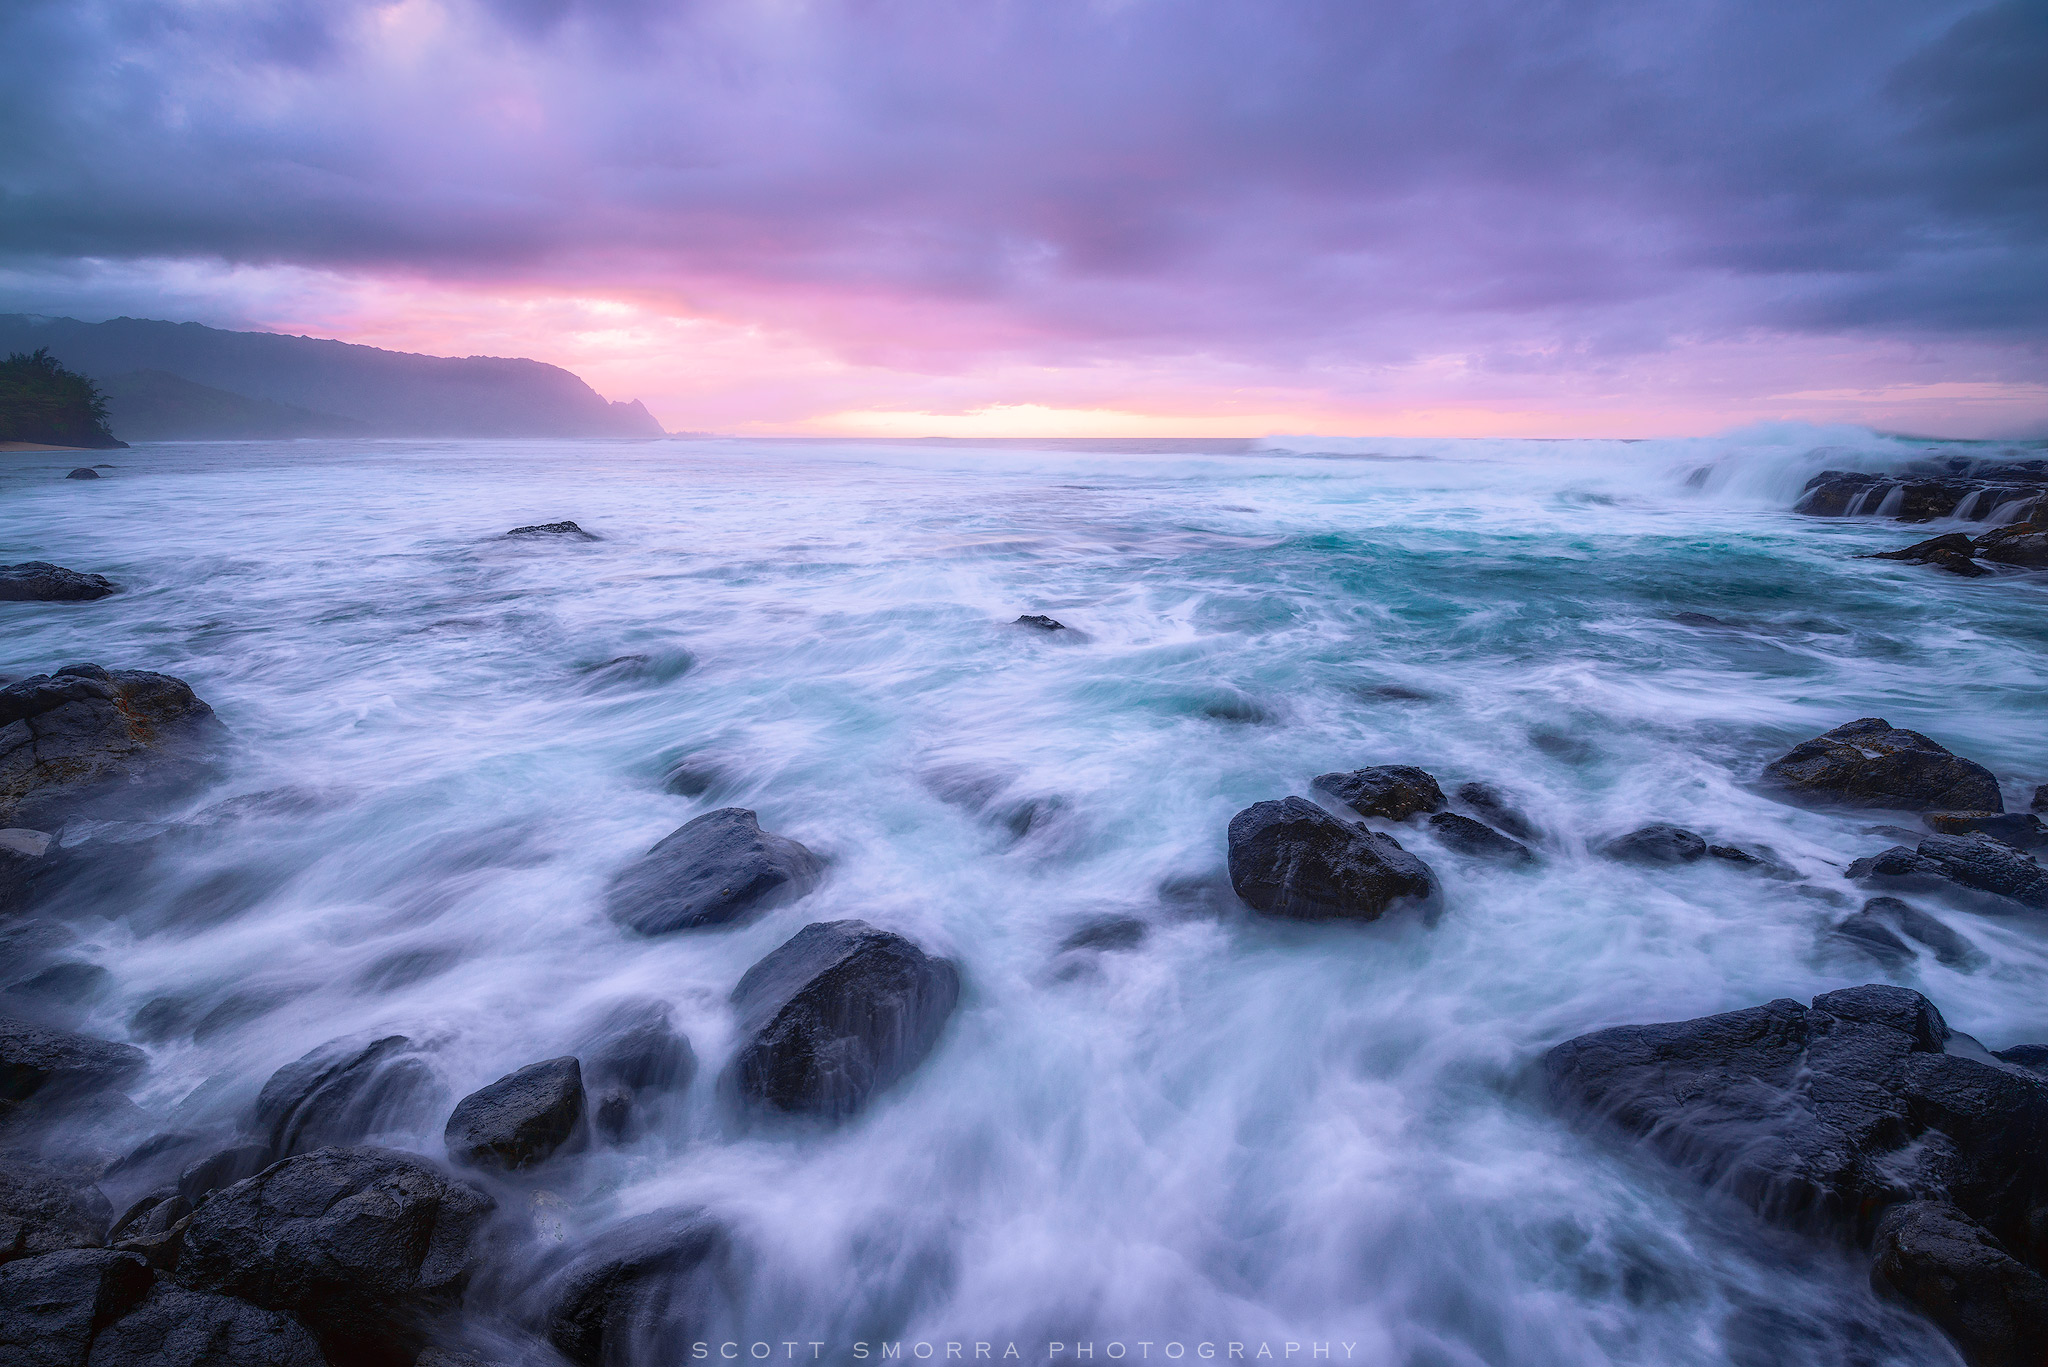 Fine Art Limited Edition of 50 - A beautiful tropical sunset near Hanalei/Princeville, Kauai, Hawaii. The north shore of Kauai...